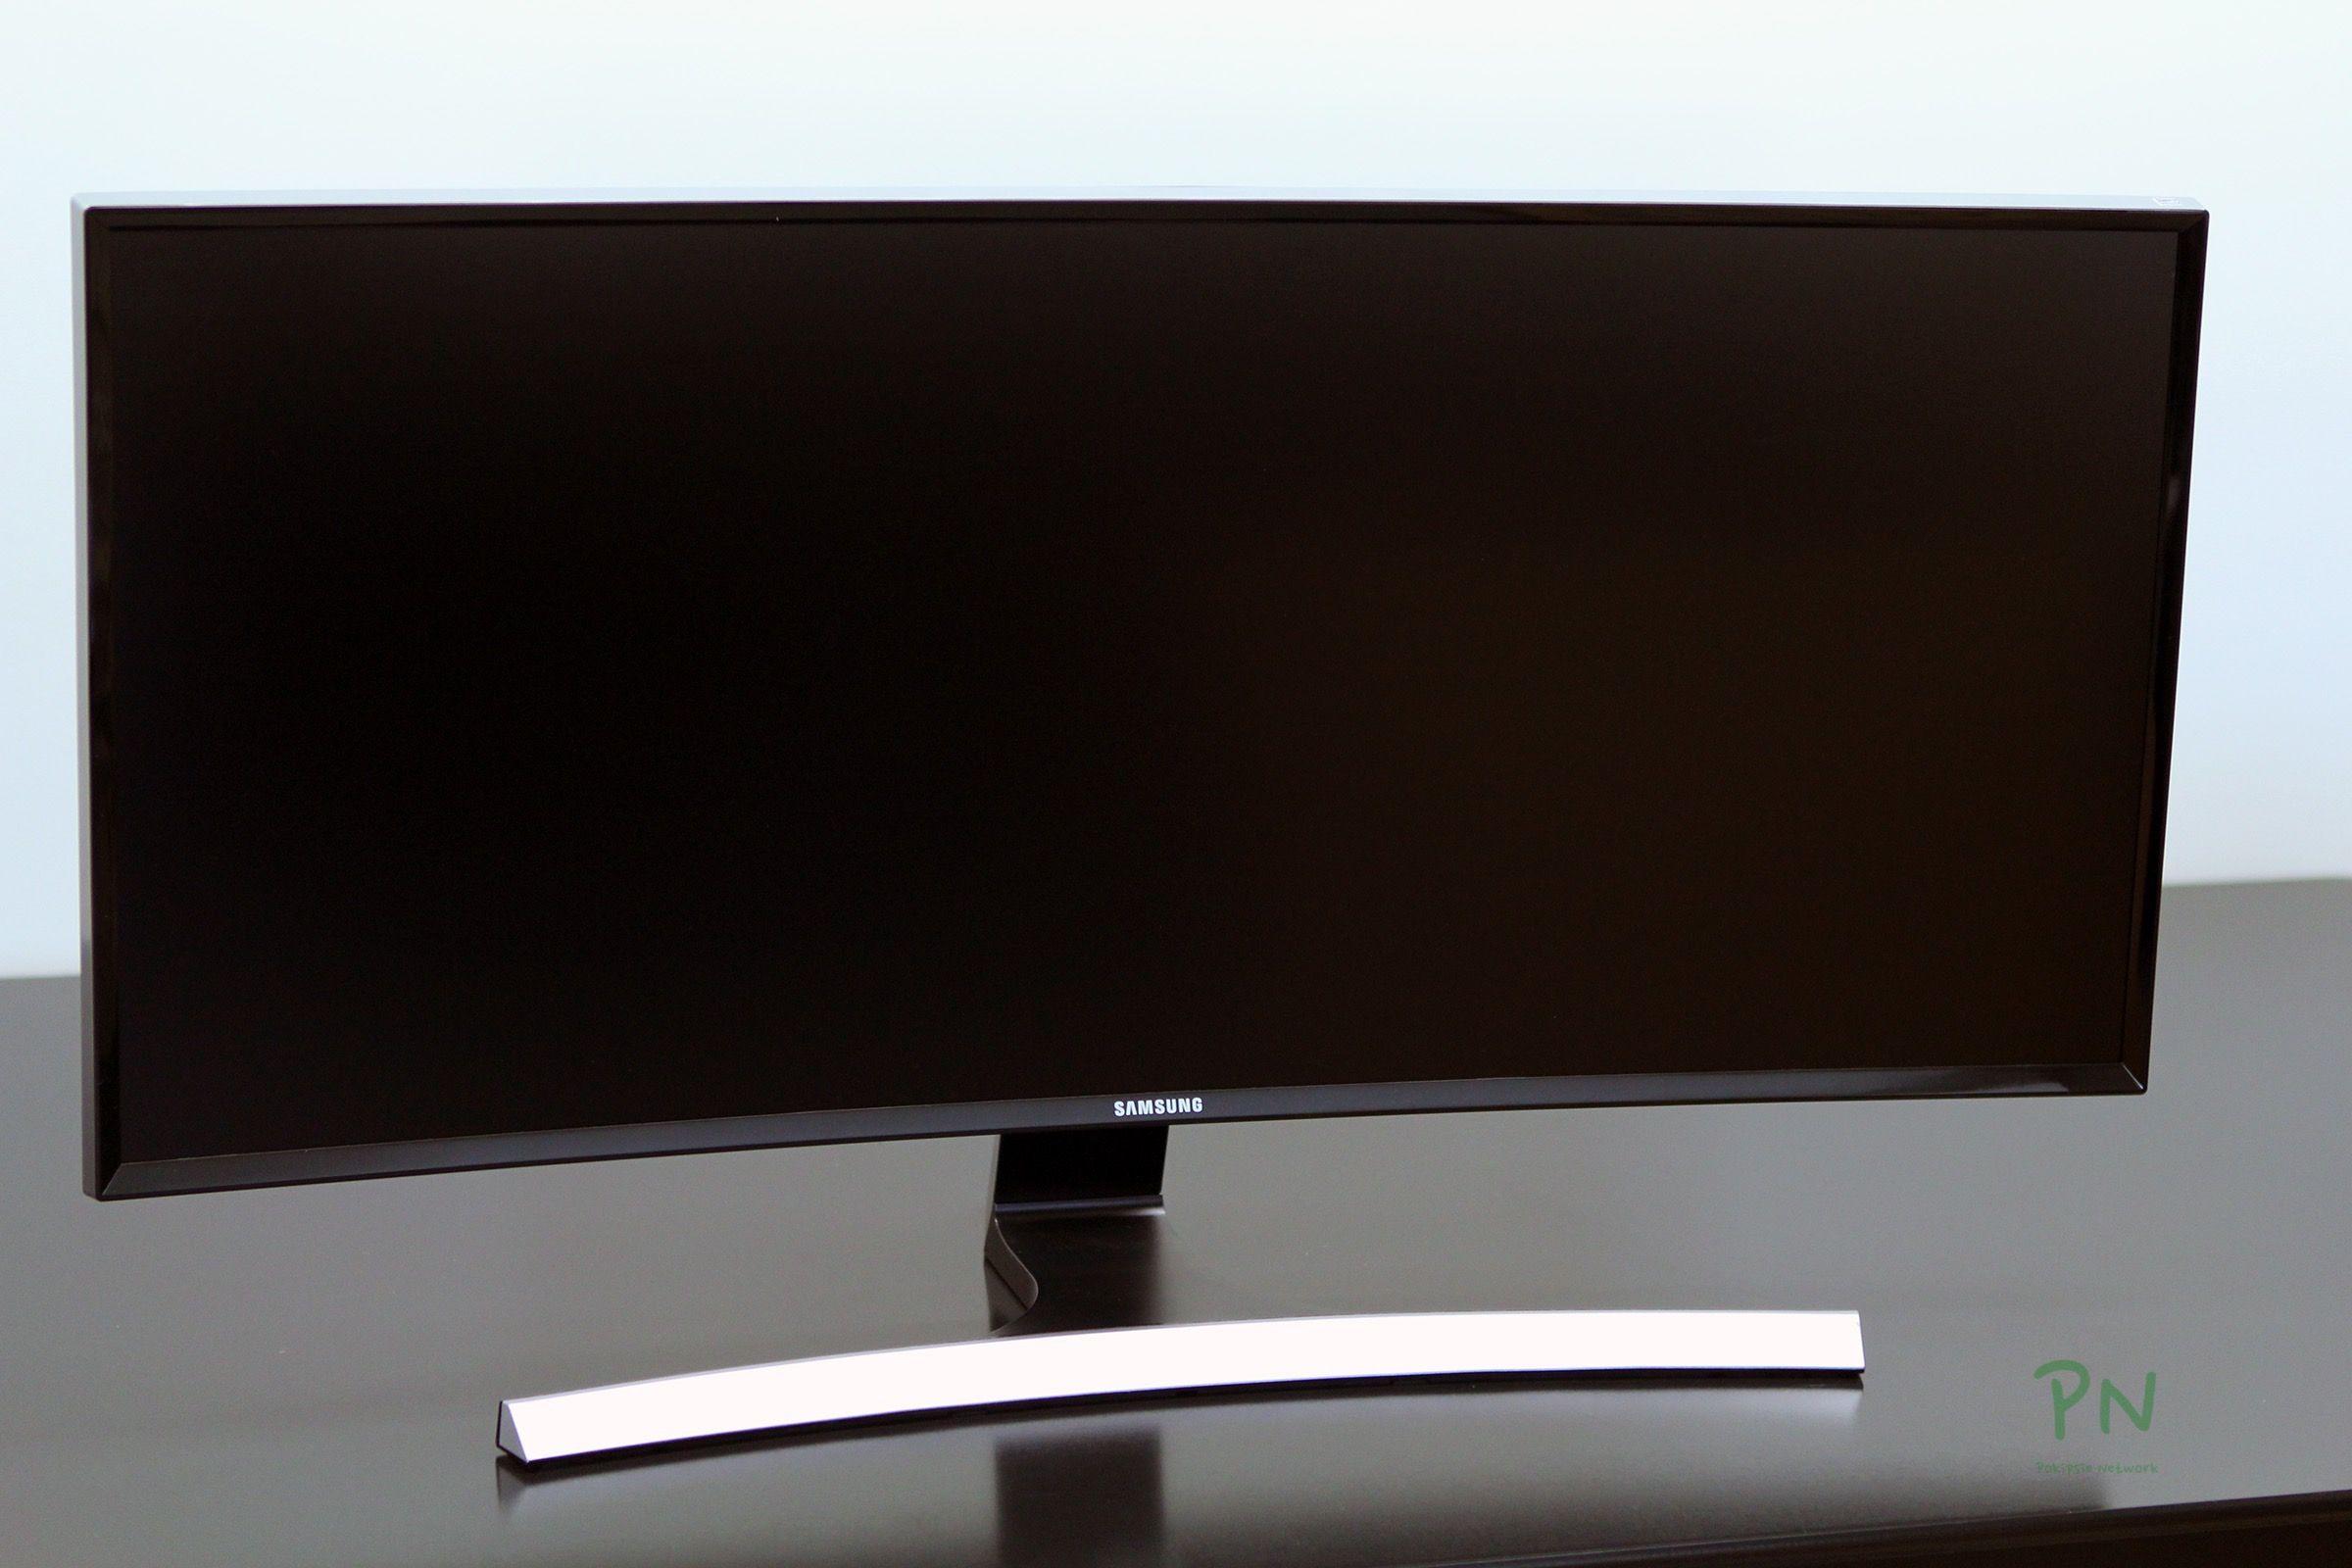 Samsung 34″ Curved Display SE790C